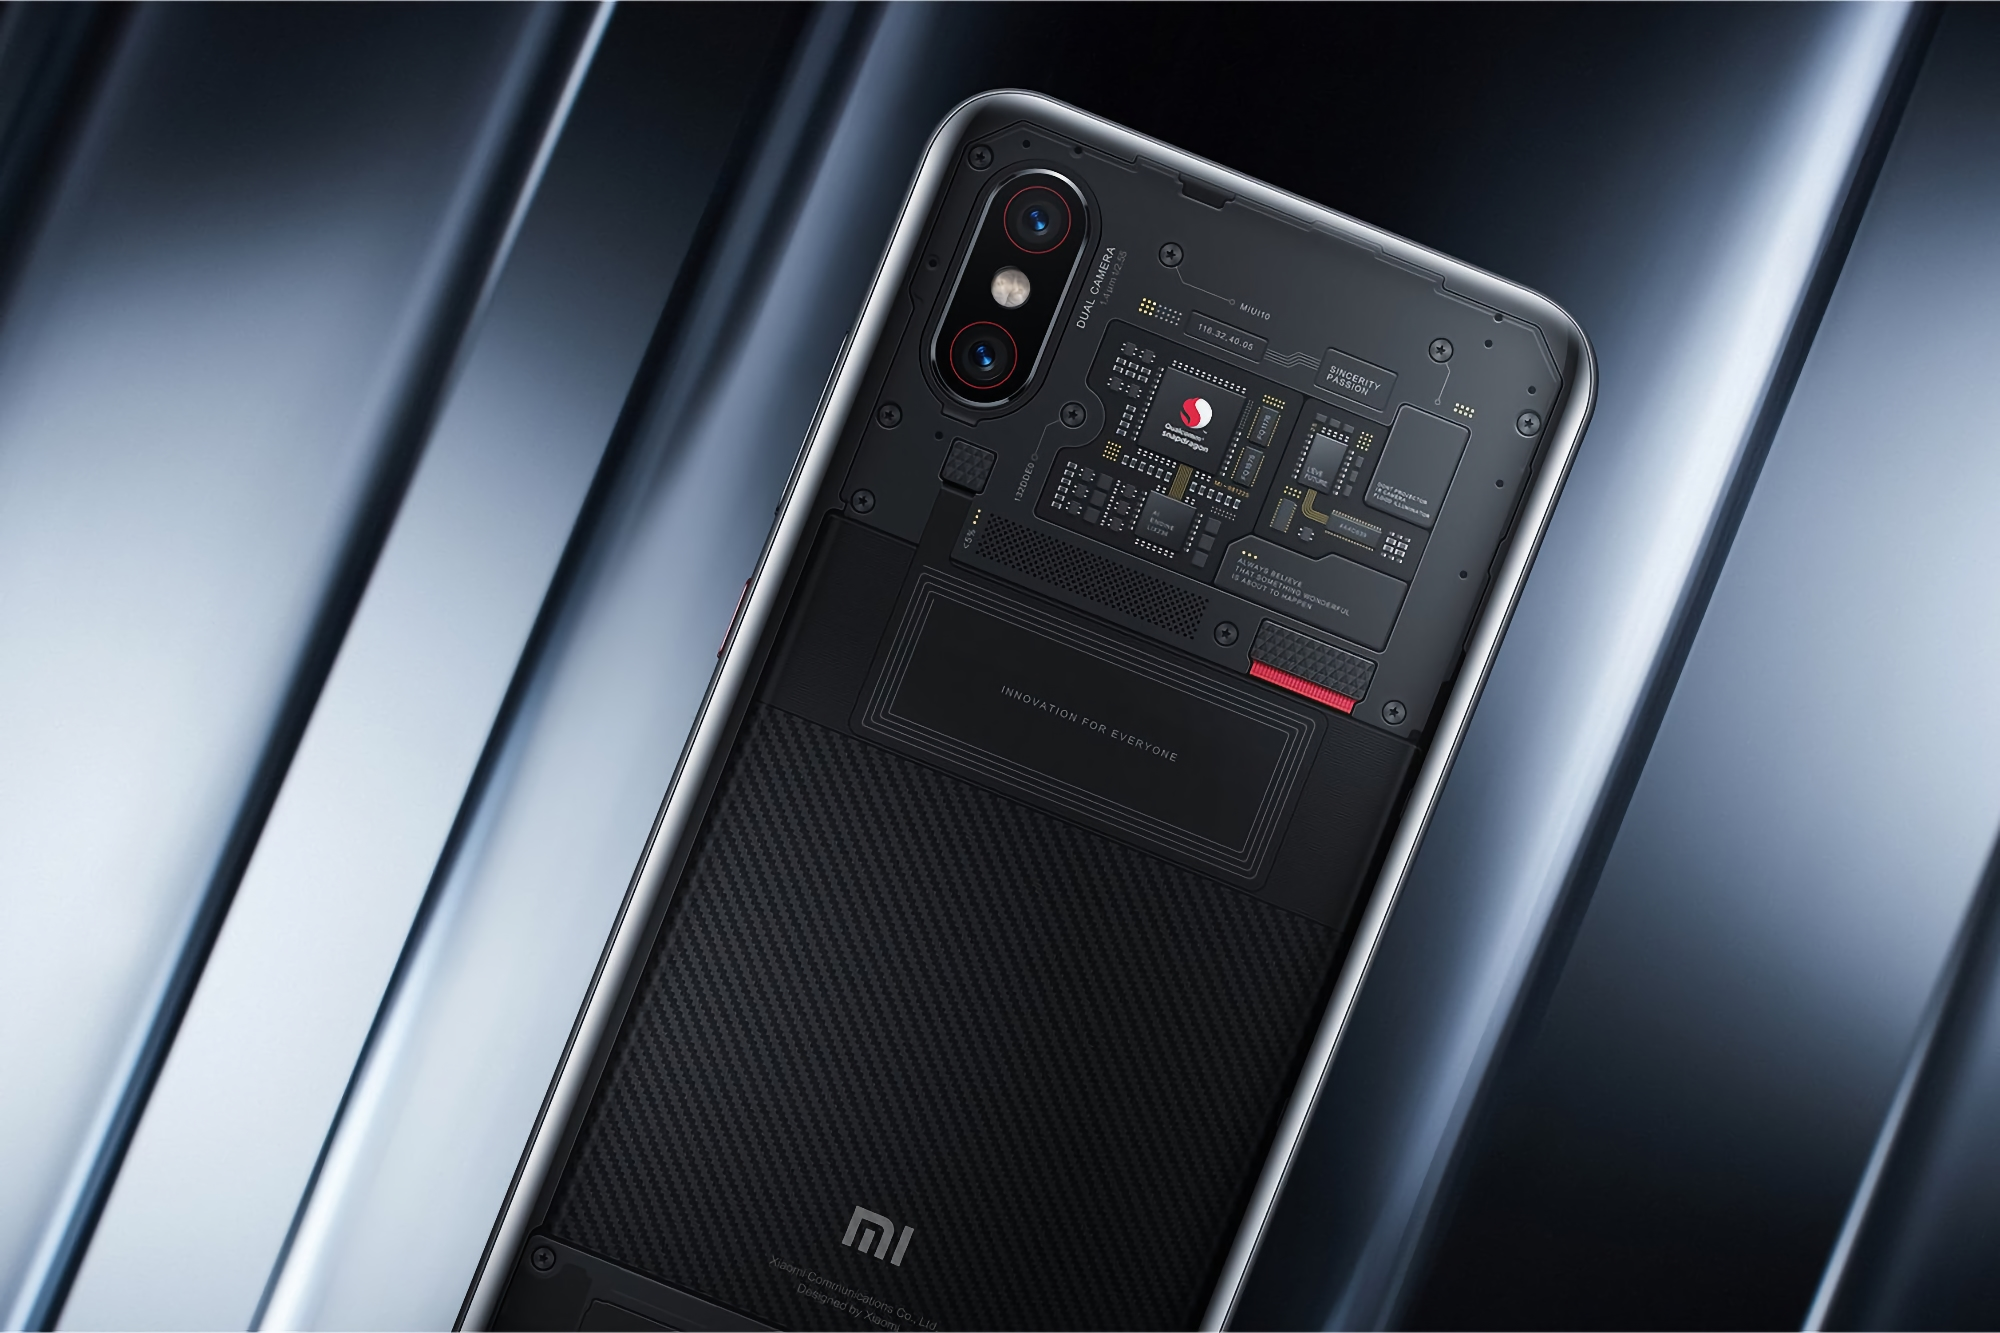 Xiaomi Mi 8 Pro, Xiaomi Mi 8 SE и Xiaomi Mi 8 Explorer Edition начали обновляться до MIUI 12.5